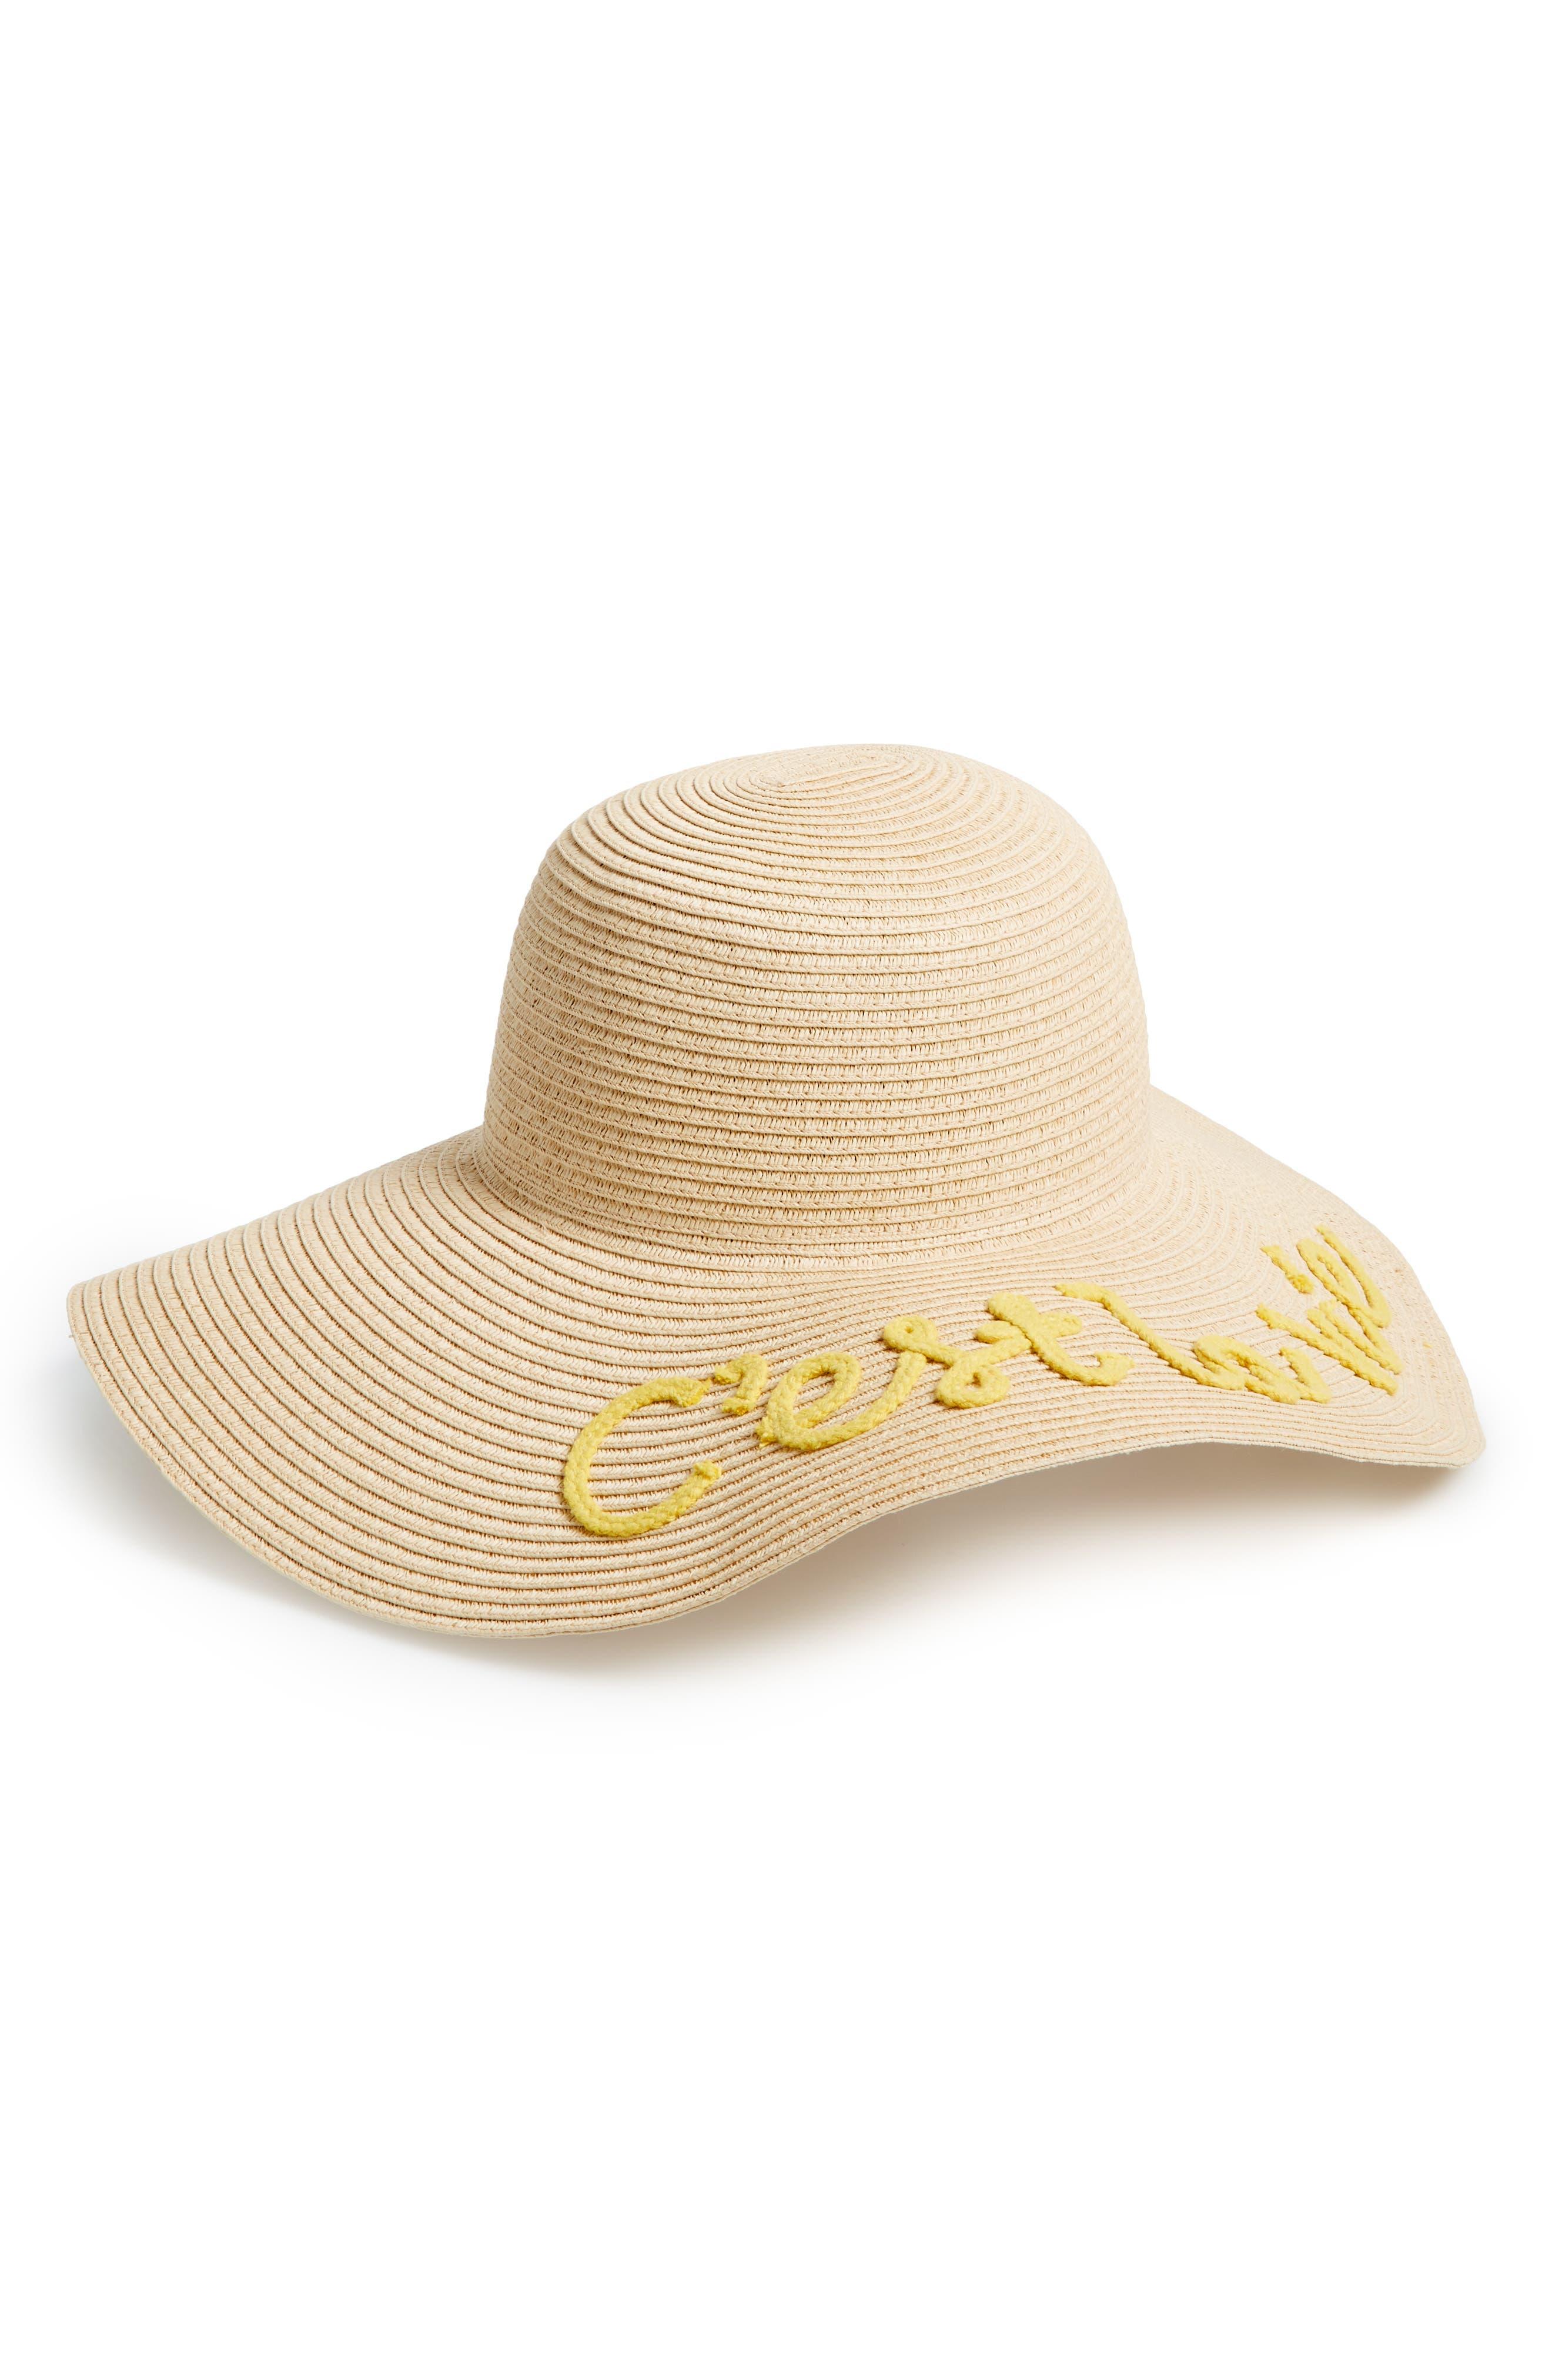 Main Image - BP. C'est La Vie Floppy Straw Hat